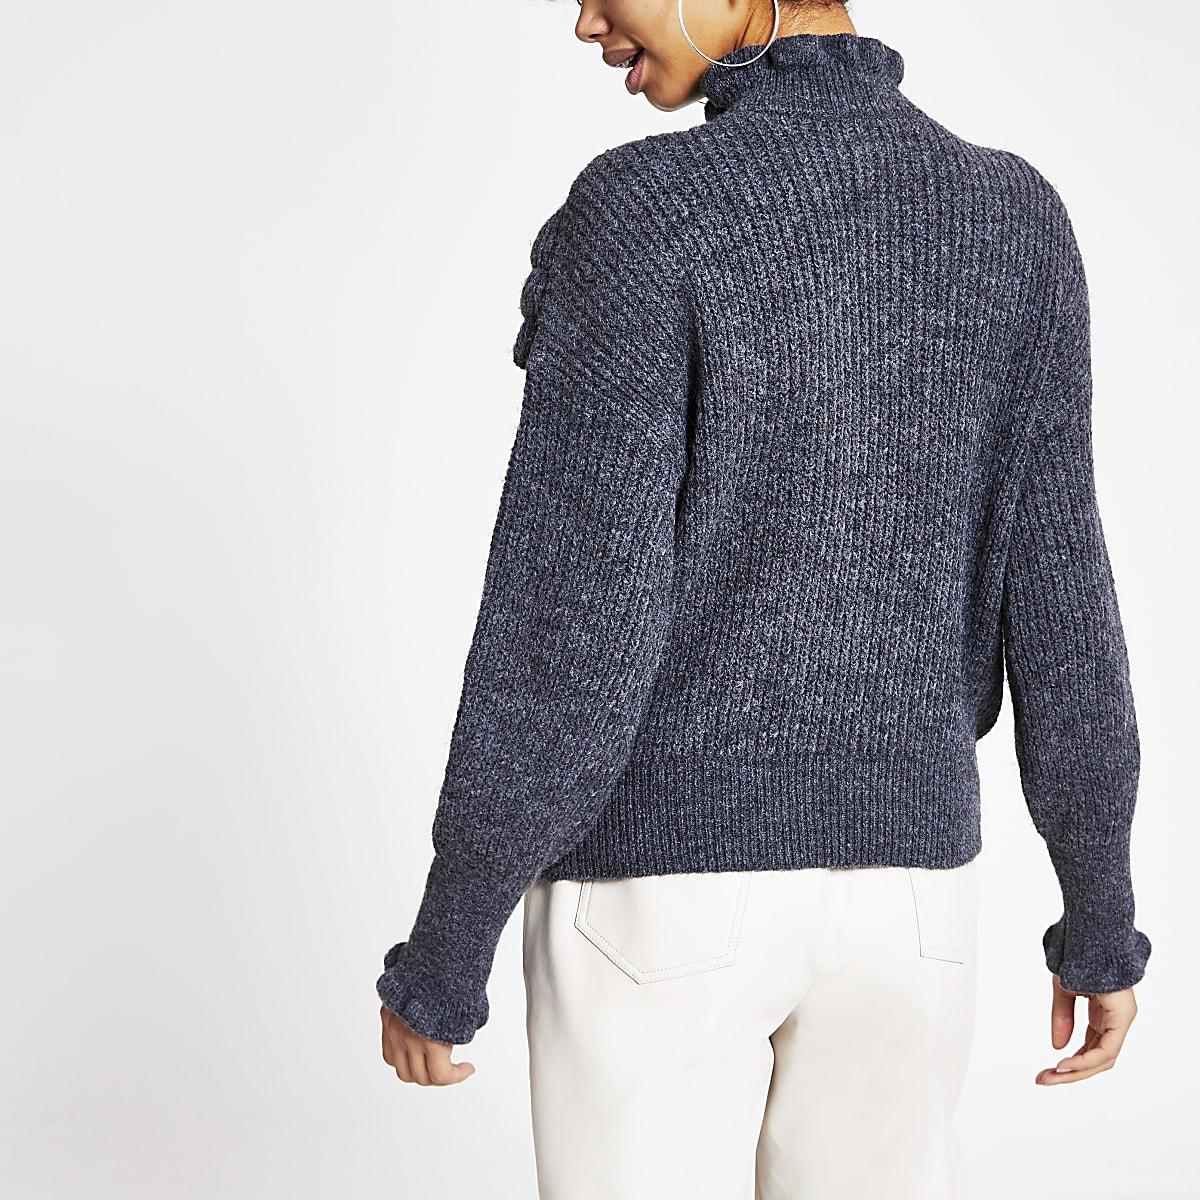 Grey ruffle frill knitted jumper